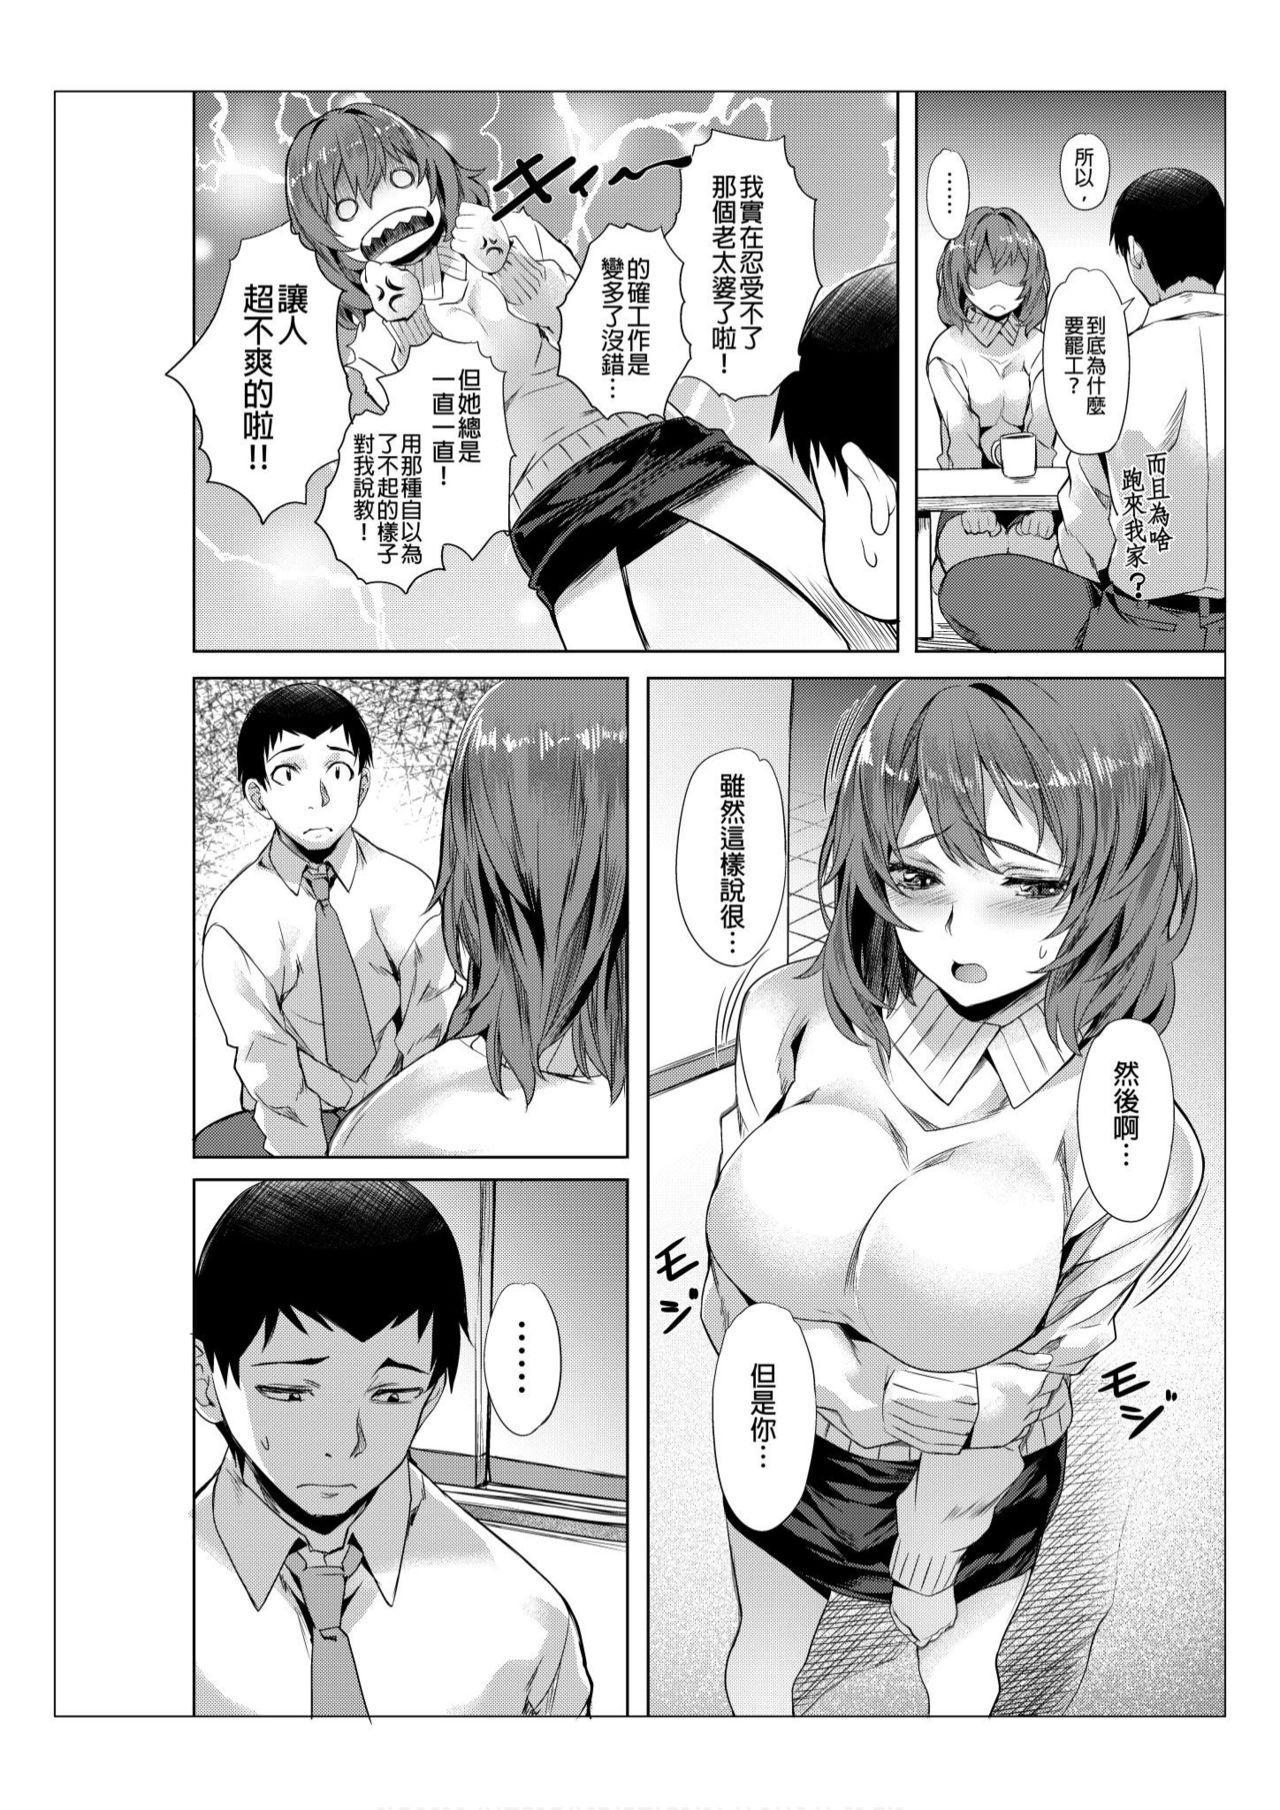 [Nagayori] Towel Ichimai de Otoko Buro.~ Shiranai Ojisan-tachi to Honiki Sex ~ | 只裹了條小毛巾就進男浴池的我。~被完全不認識的大叔們弄到高潮了~ [Chinese] [Decensored] 64